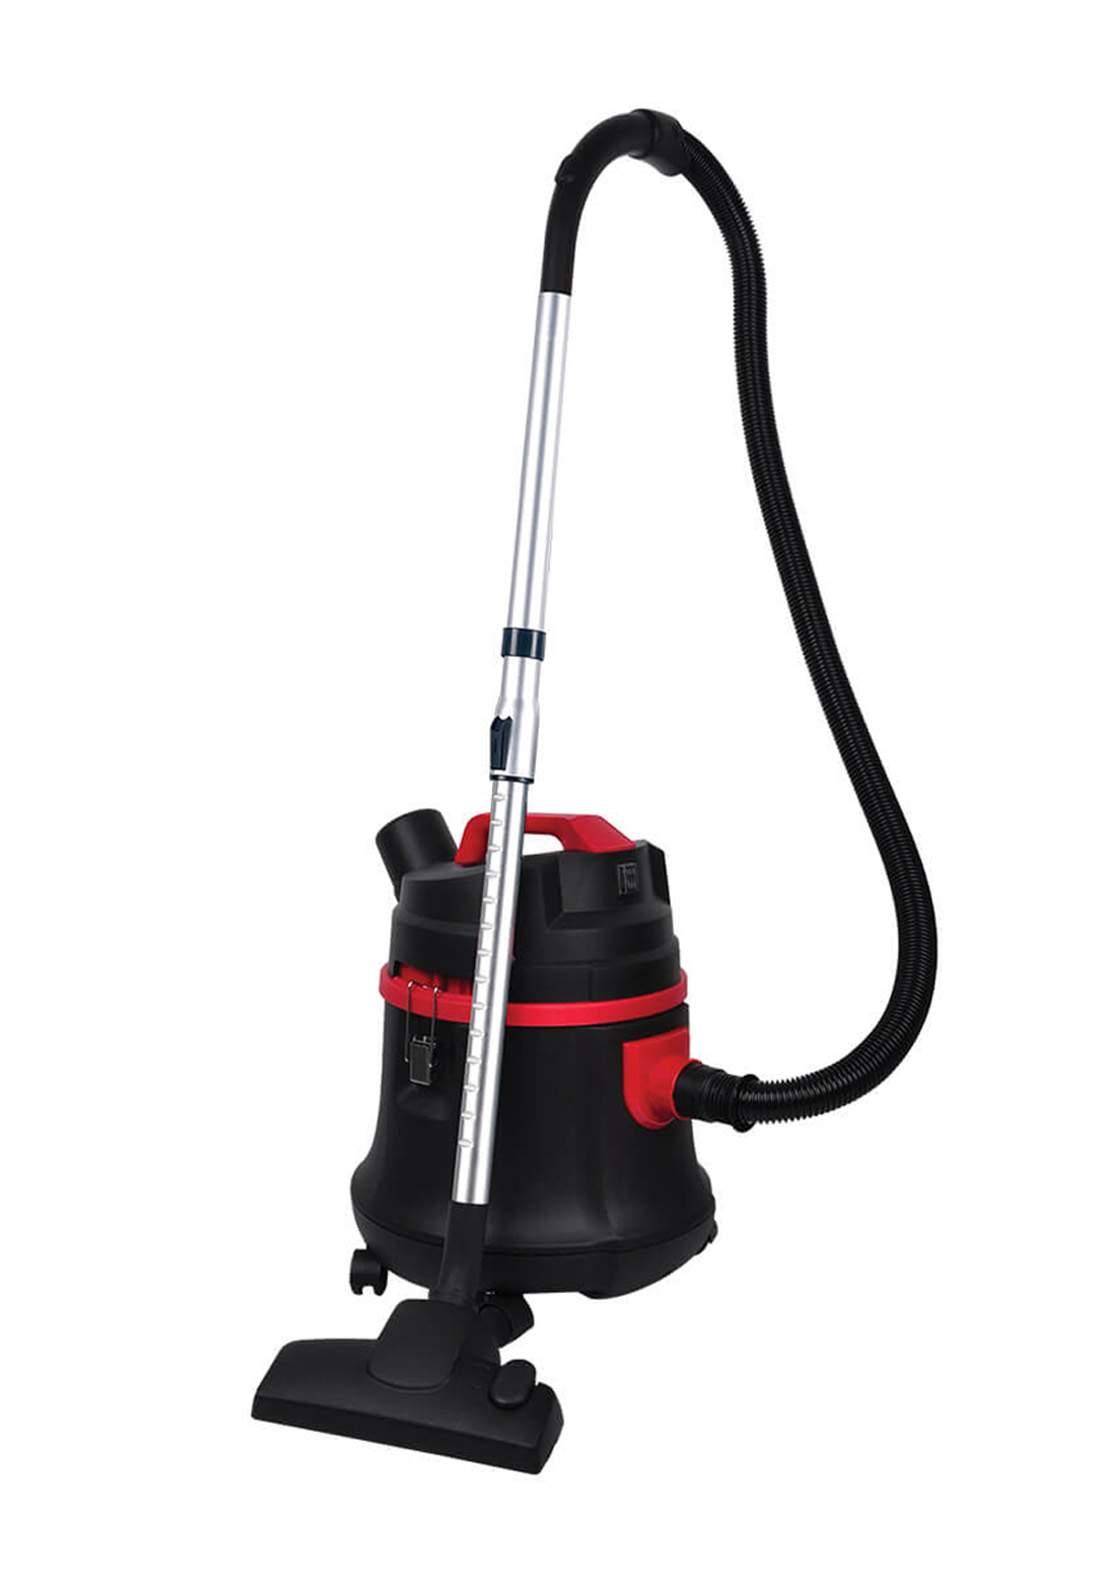 Beko ( VCW 30915 WR) Vacuum Cleaner Wet and Dry 1500 Watts 15 Liters - Black  مكنسة كهربائية